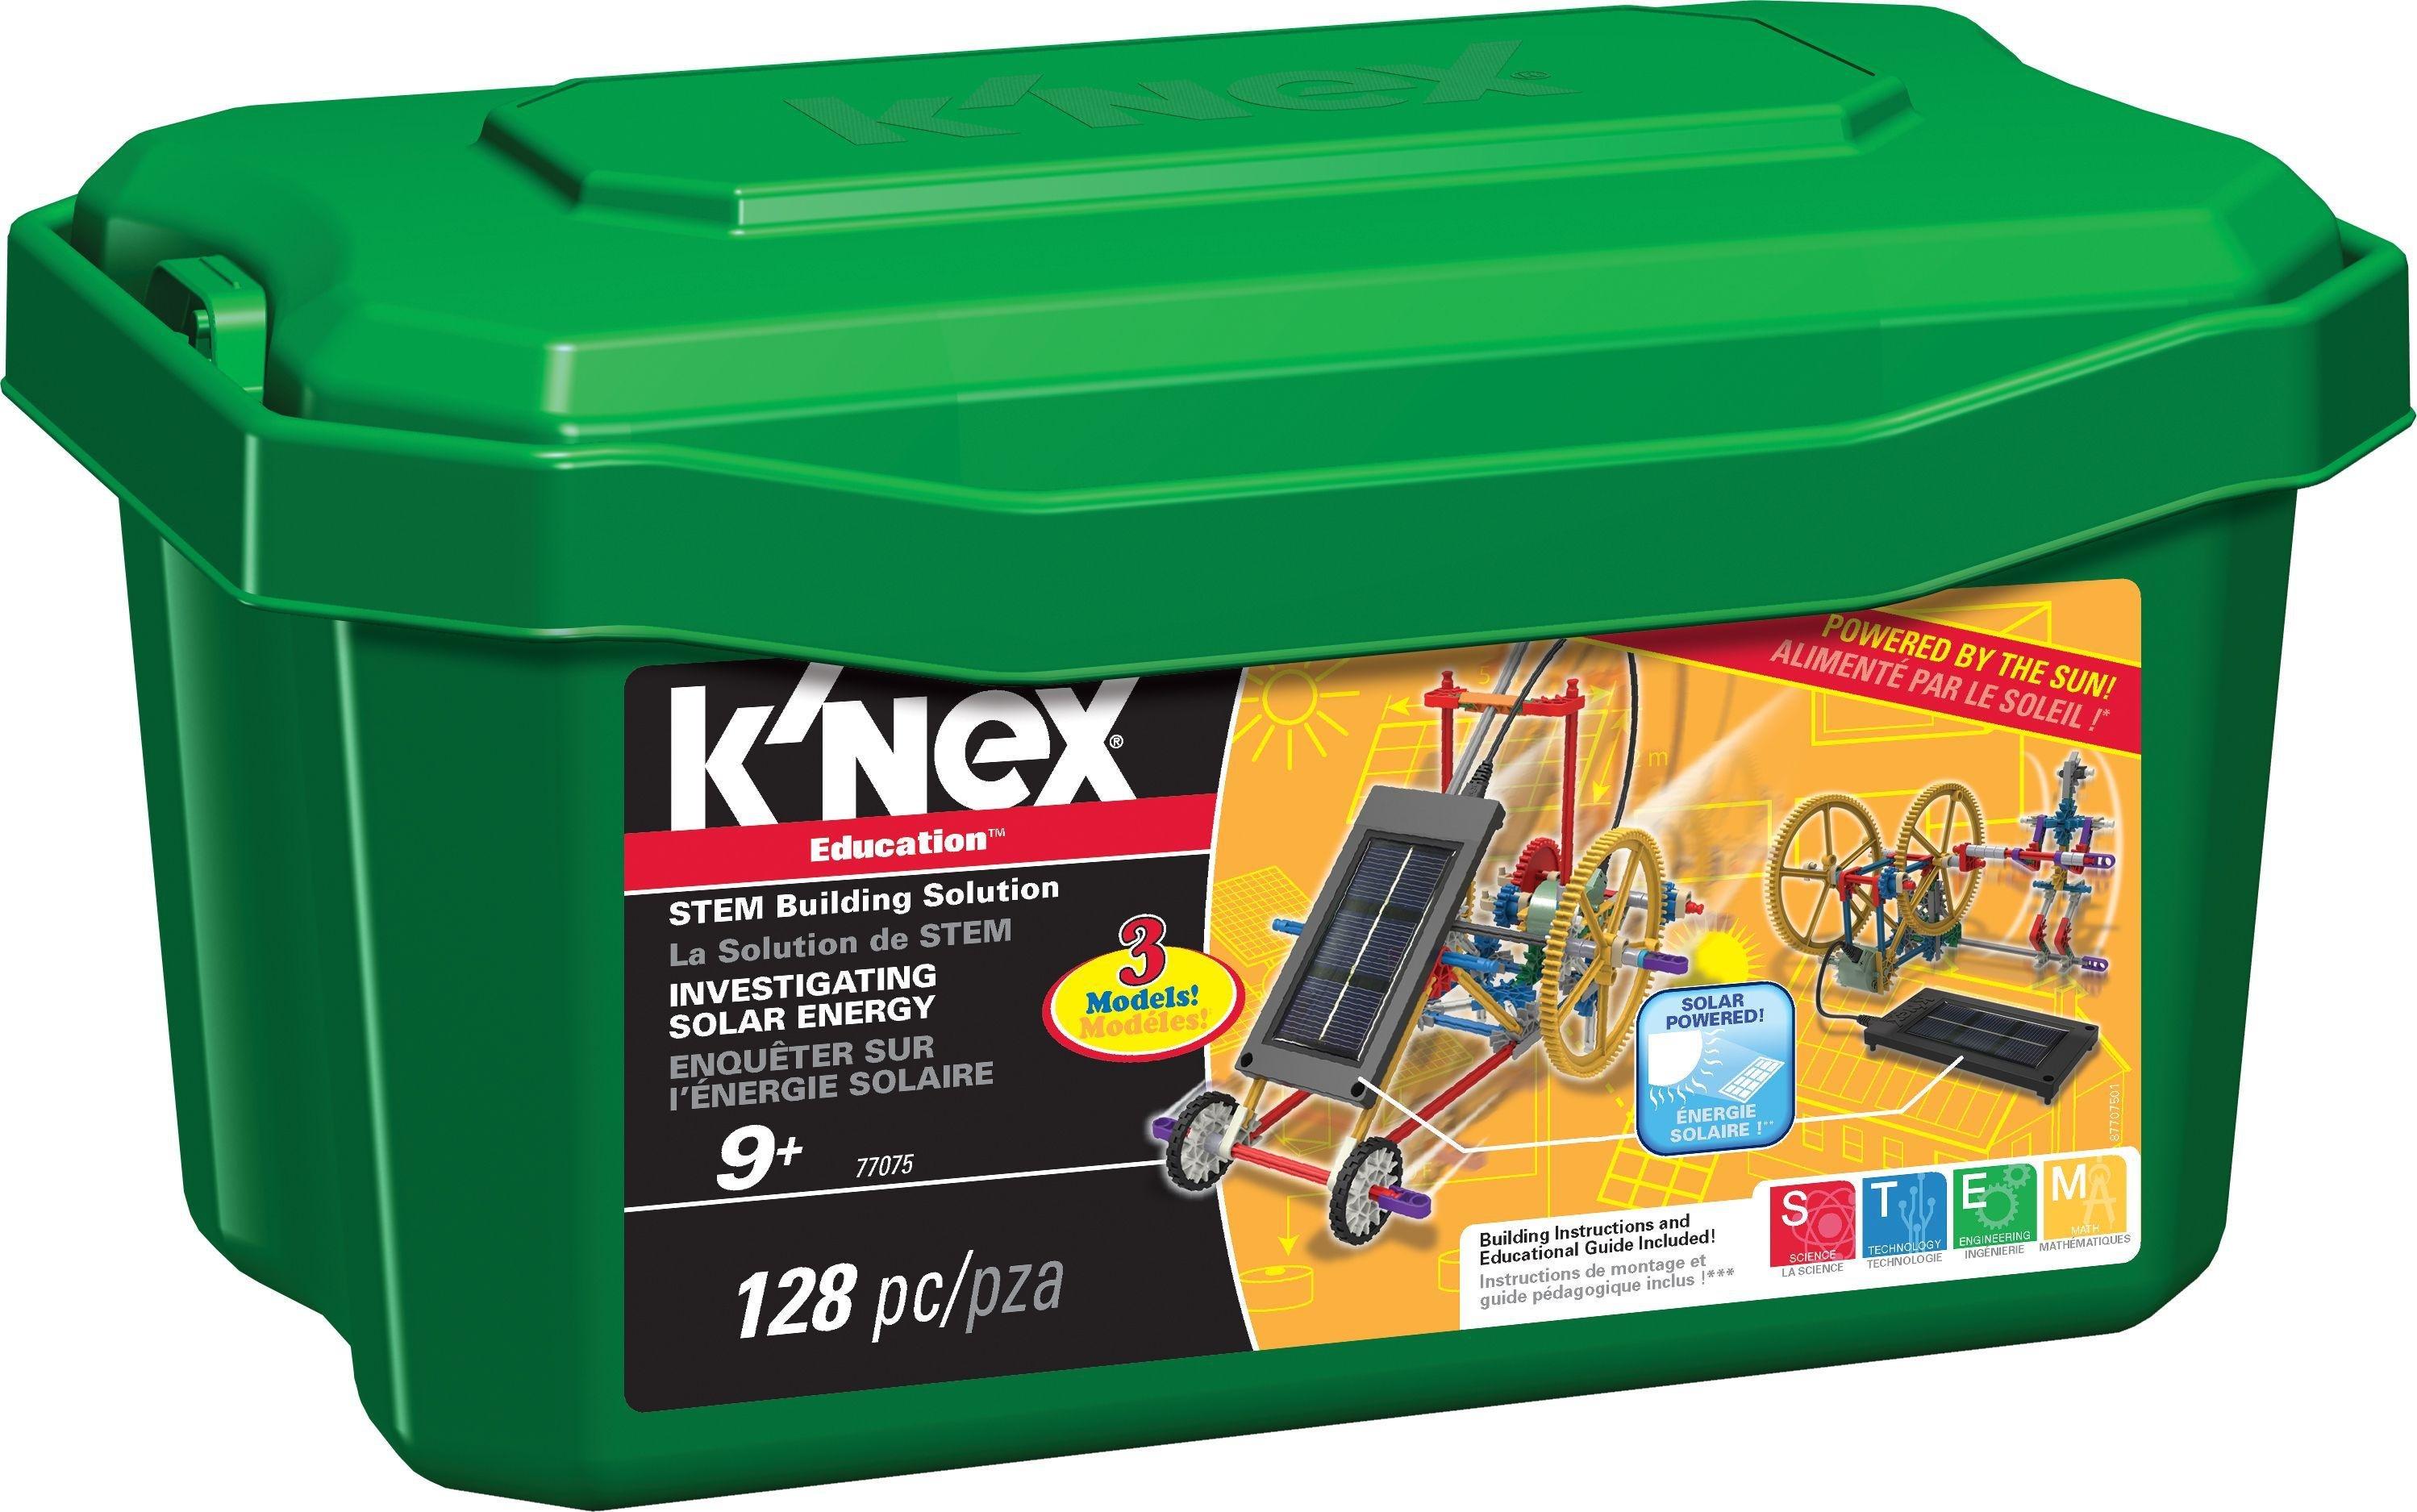 Image of K'NEX Investigating Solar Energy.